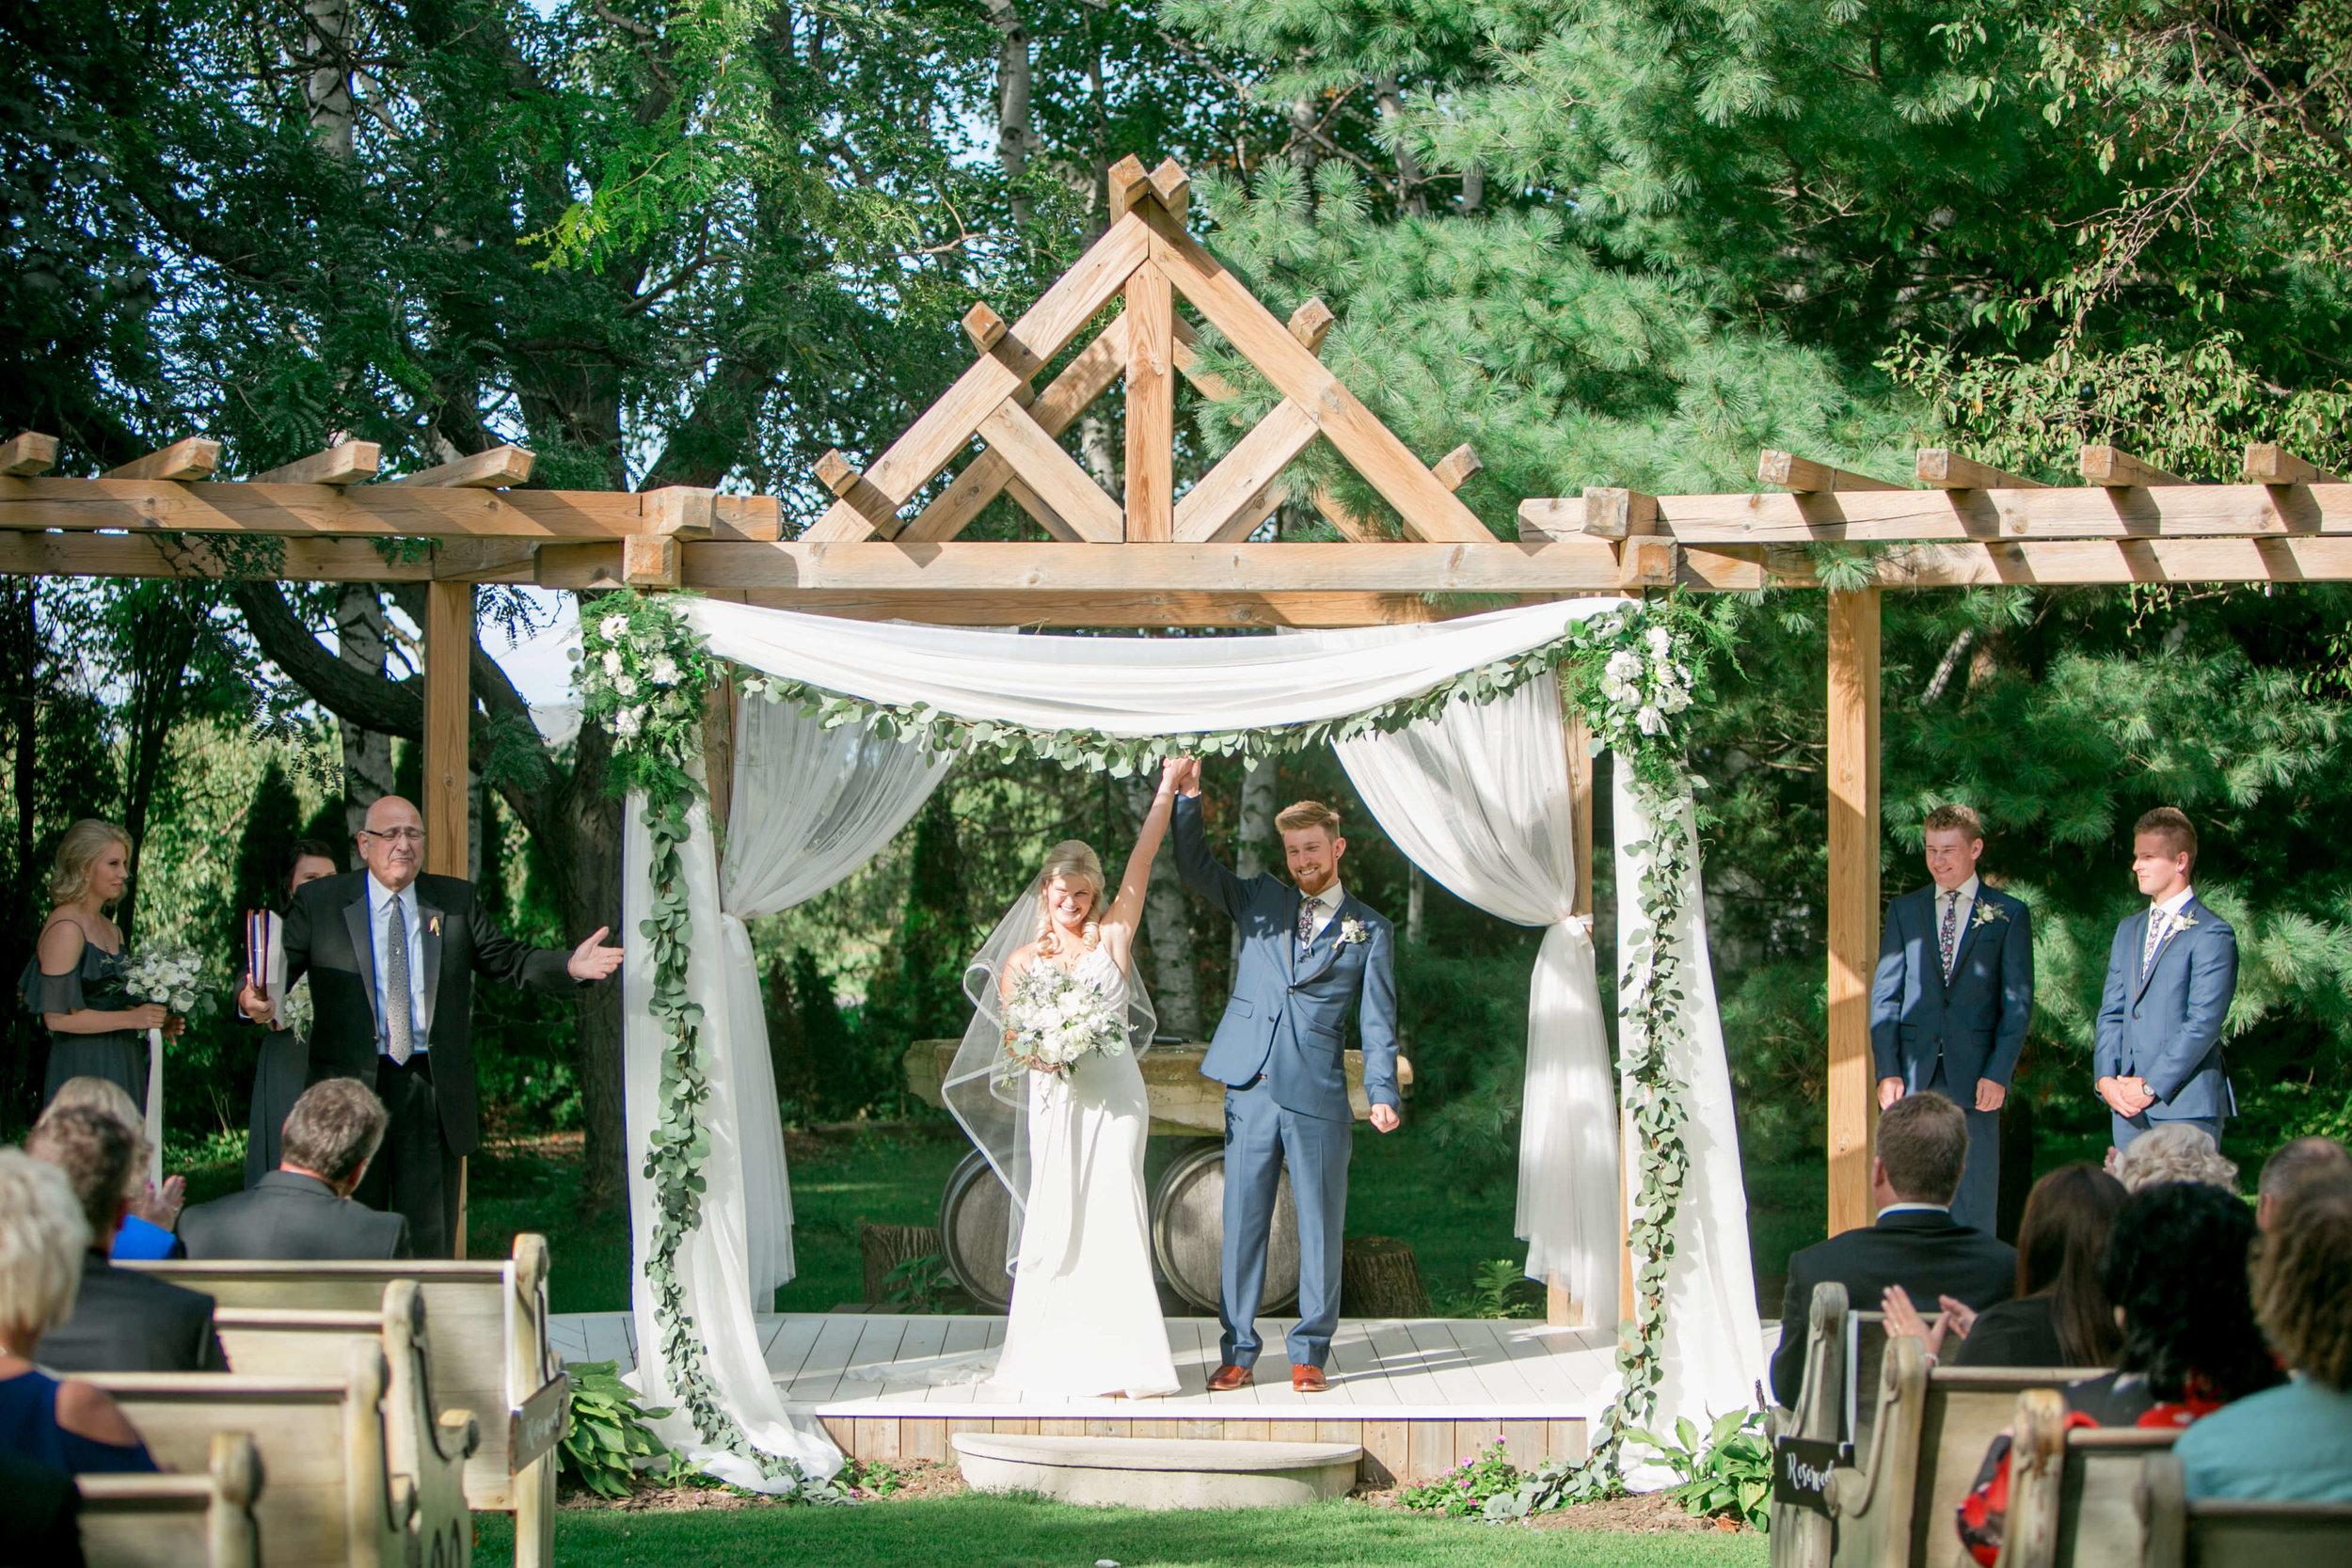 Maddy___Brandon___Daniel_Ricci_Weddings_High_Res._Finals_317.jpg